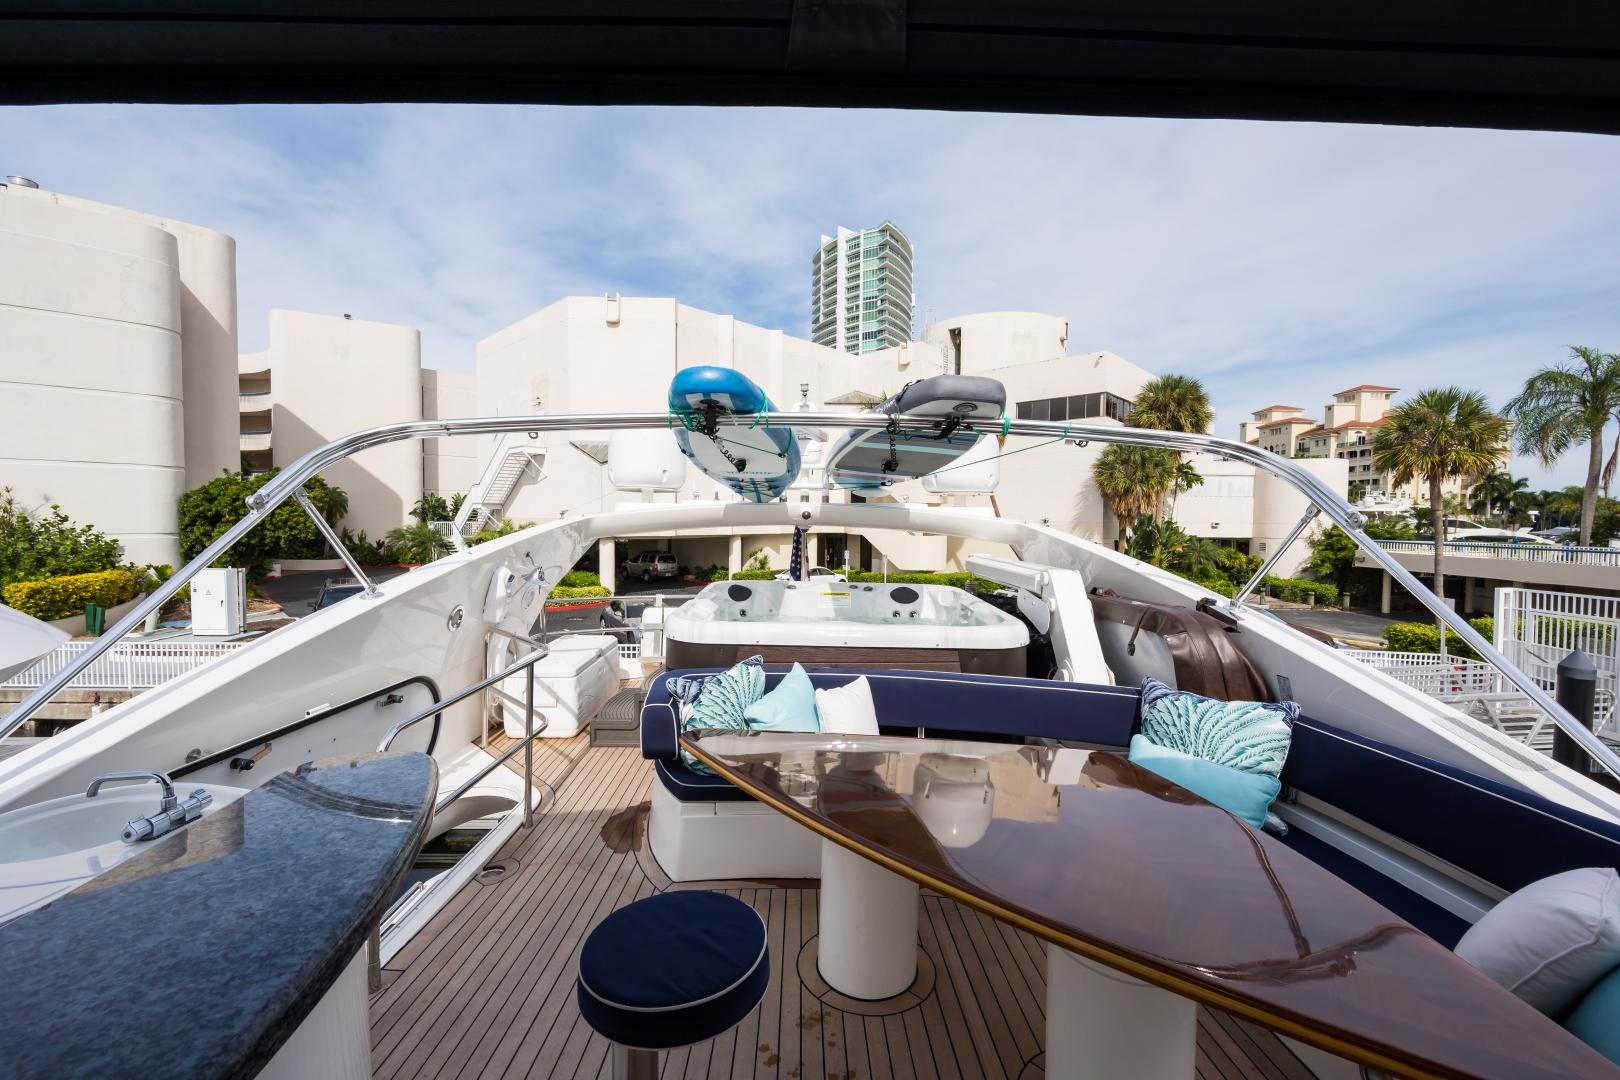 Sunseeker-Yacht 2004-TOP GUN Aventura-Florida-United States-1450712 | Thumbnail